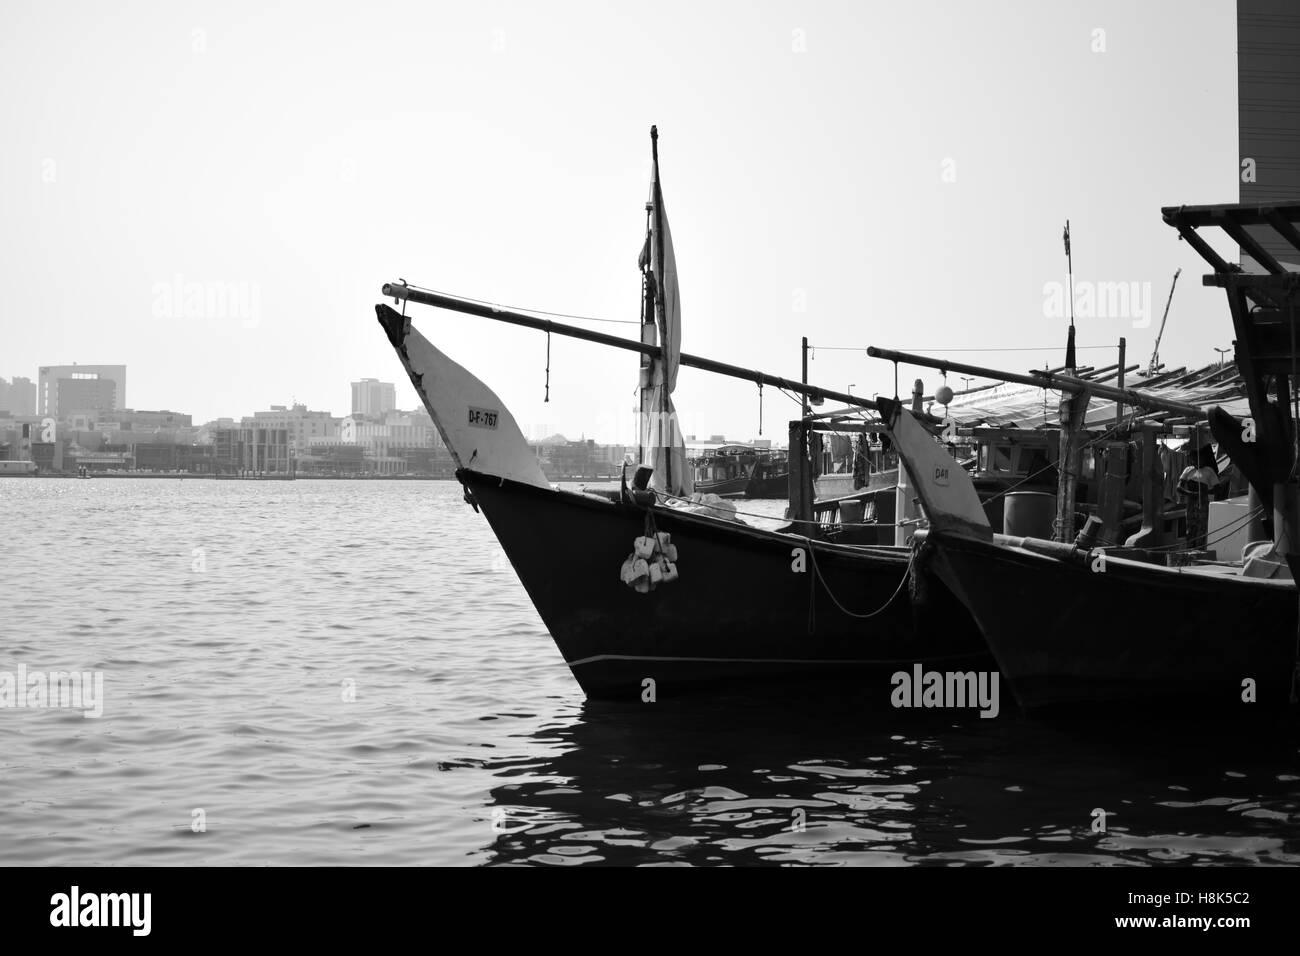 Boats in Dubai Harbour - Stock Image